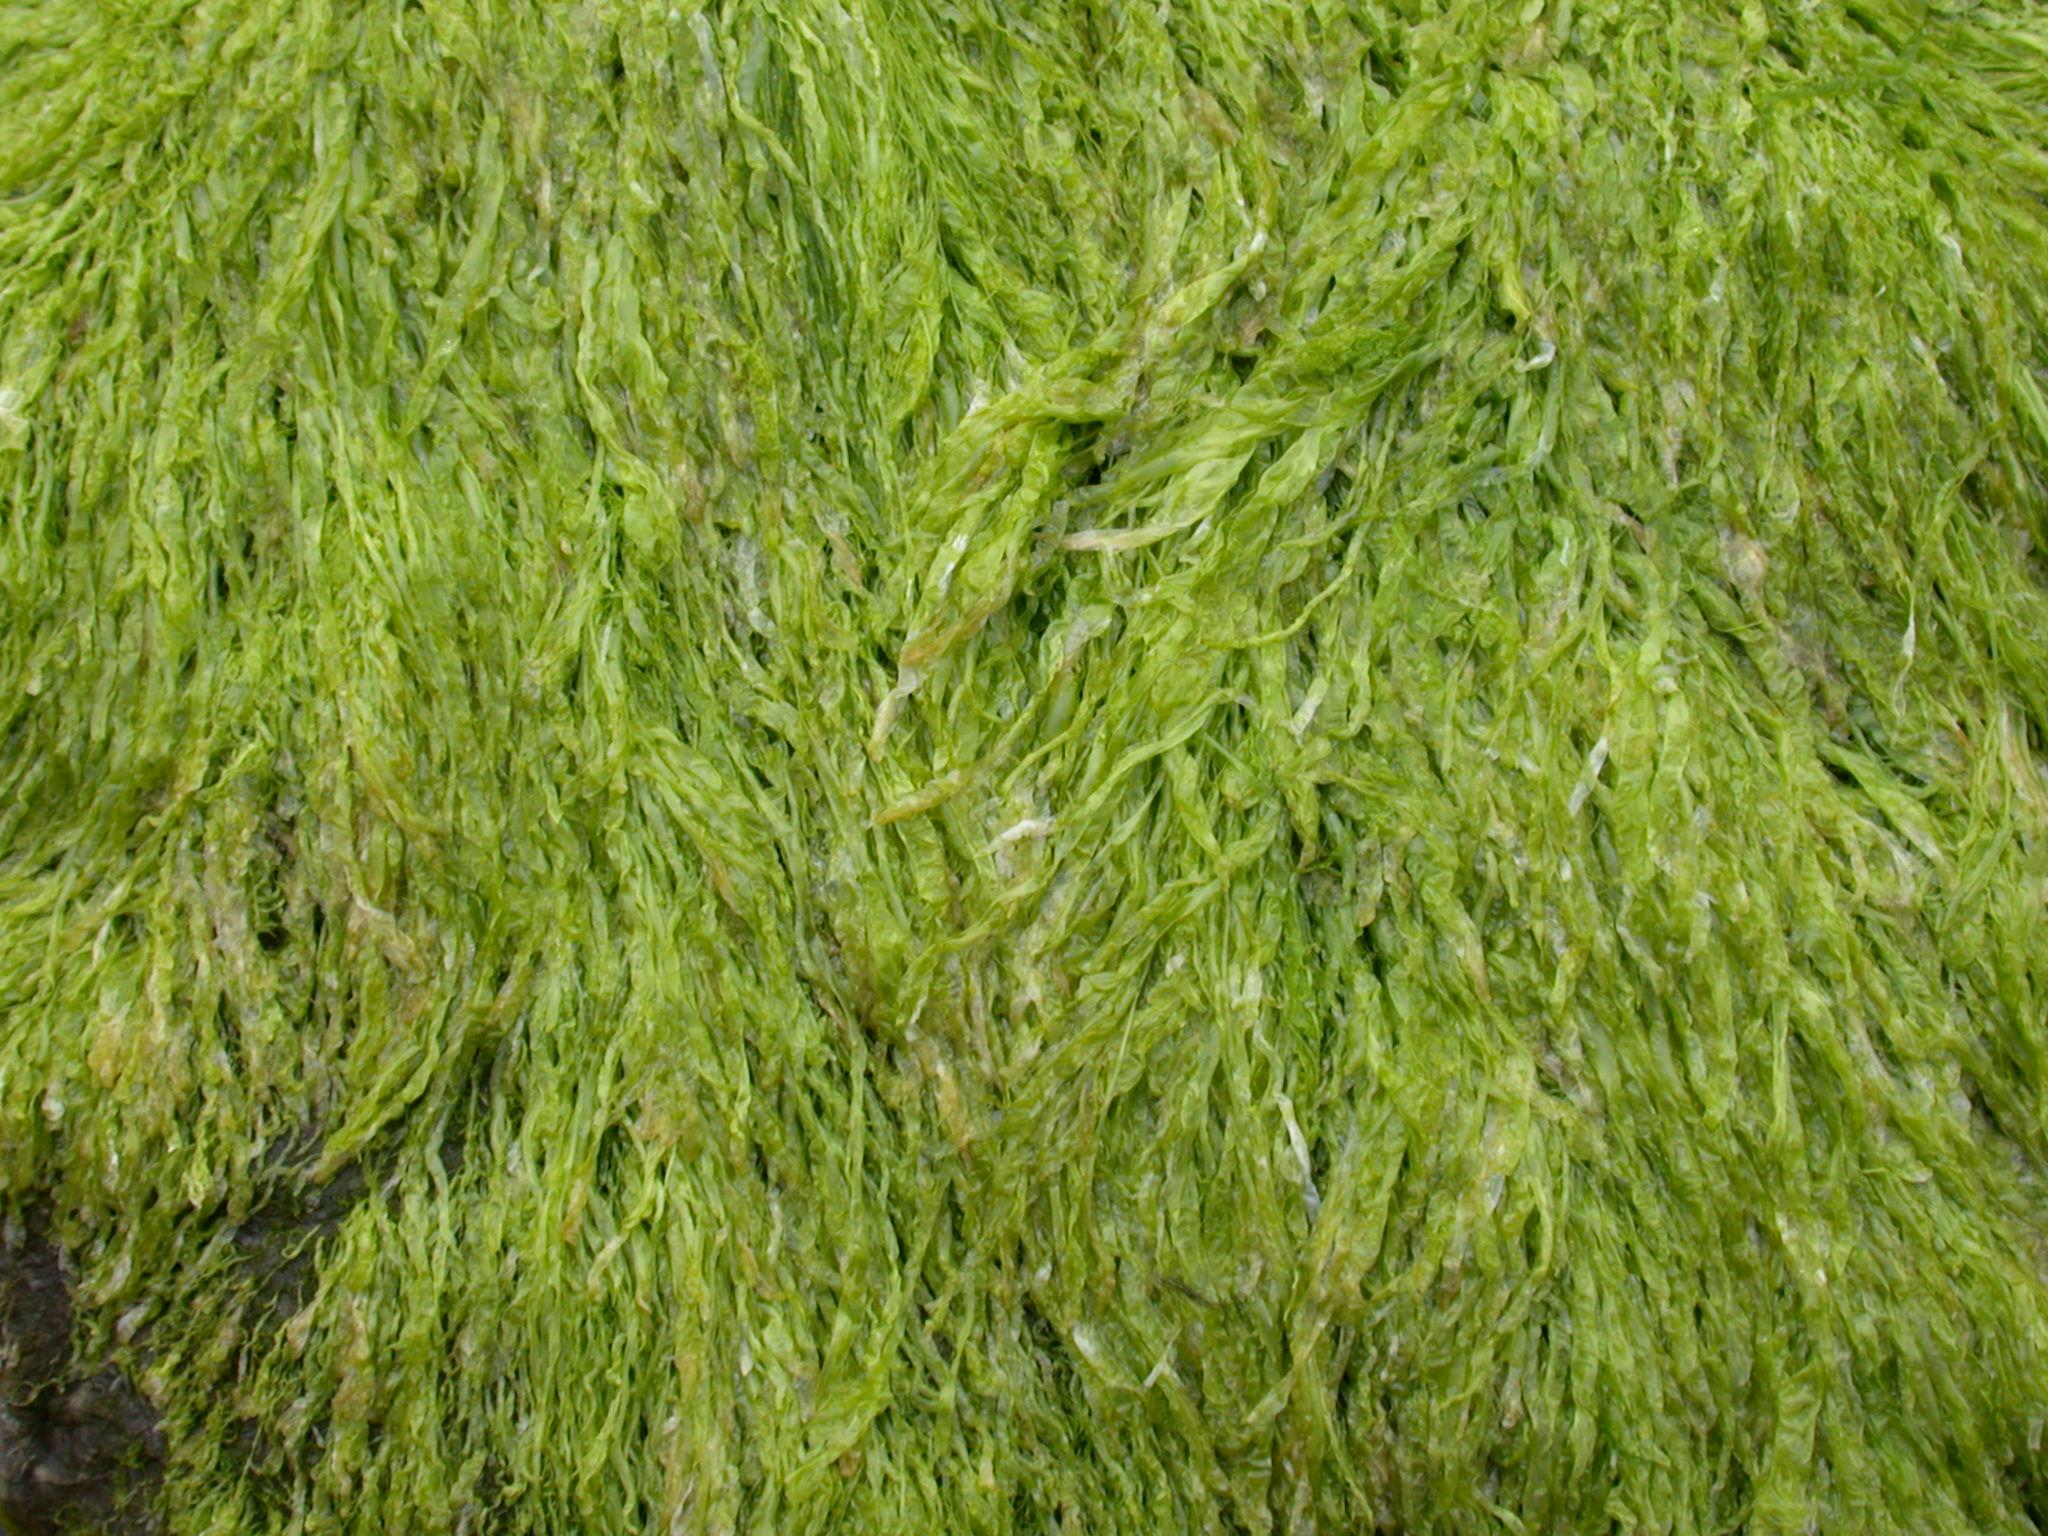 Seaweed texture photo